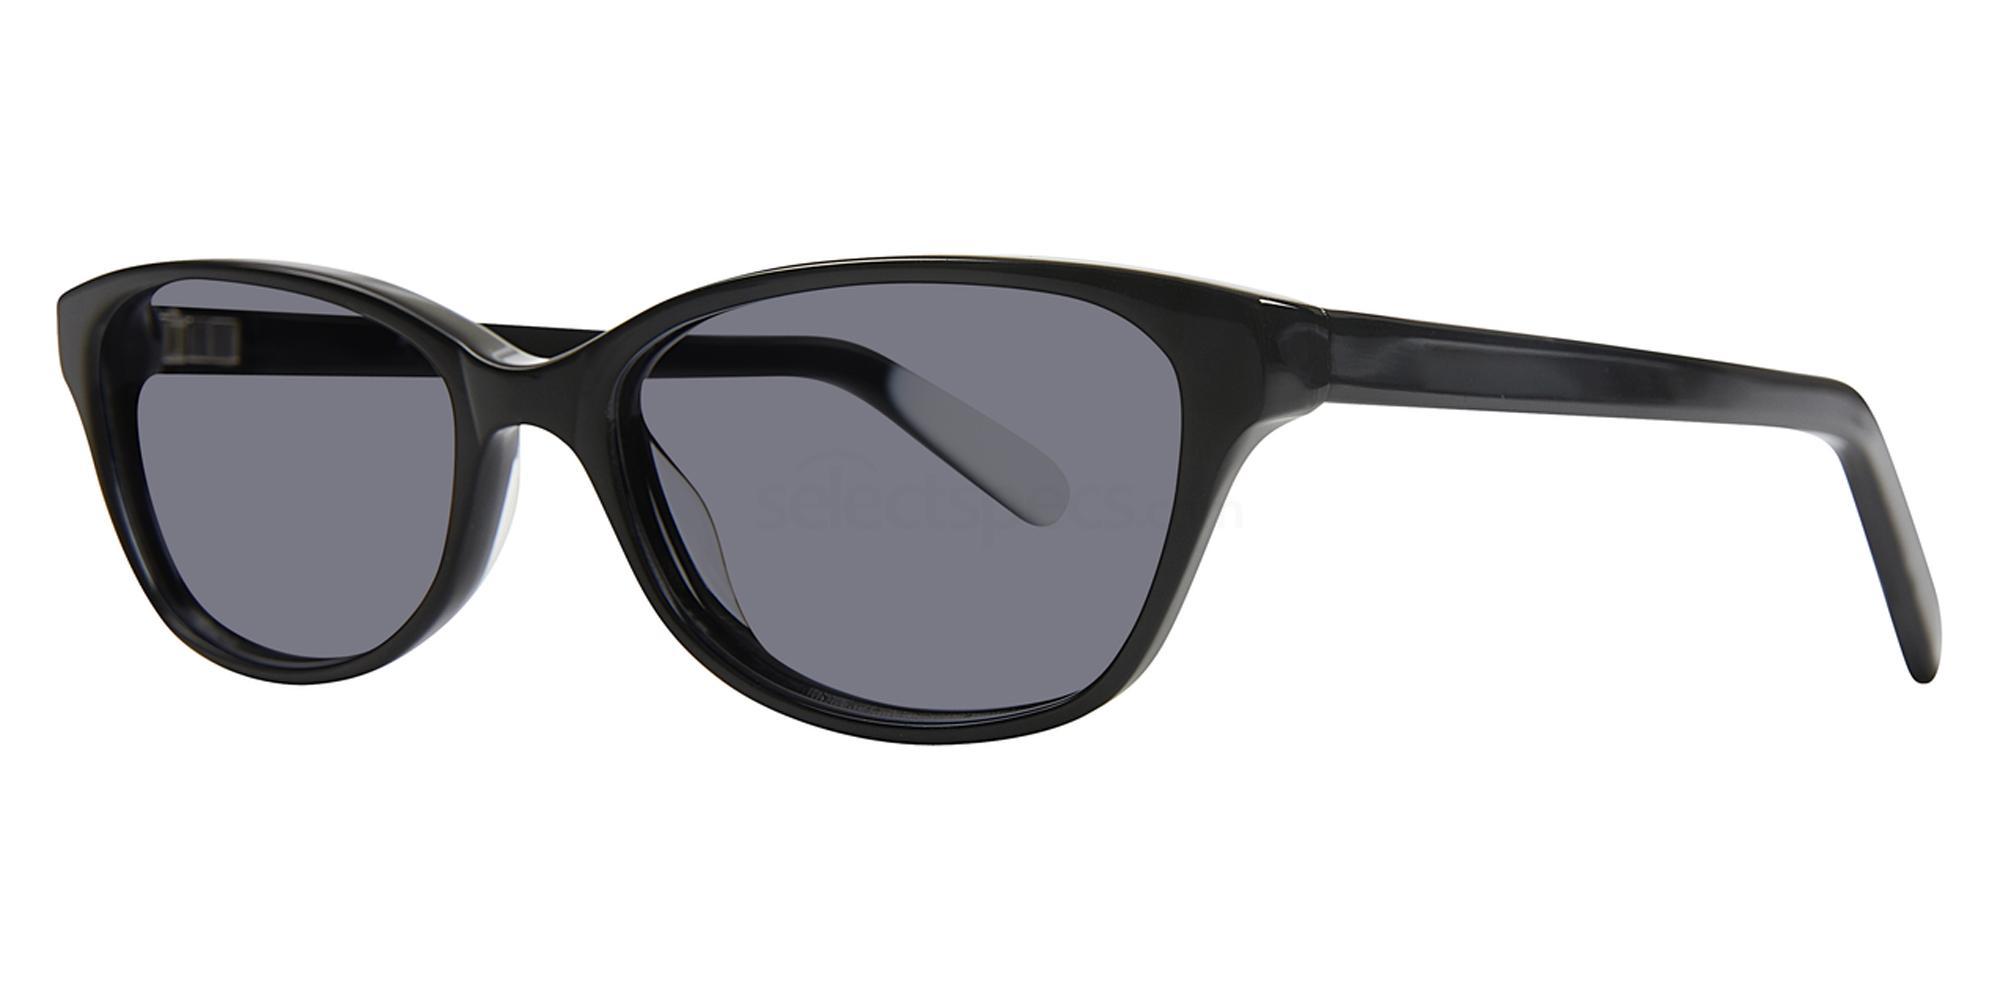 C1 Passy Sunglasses, Joseph